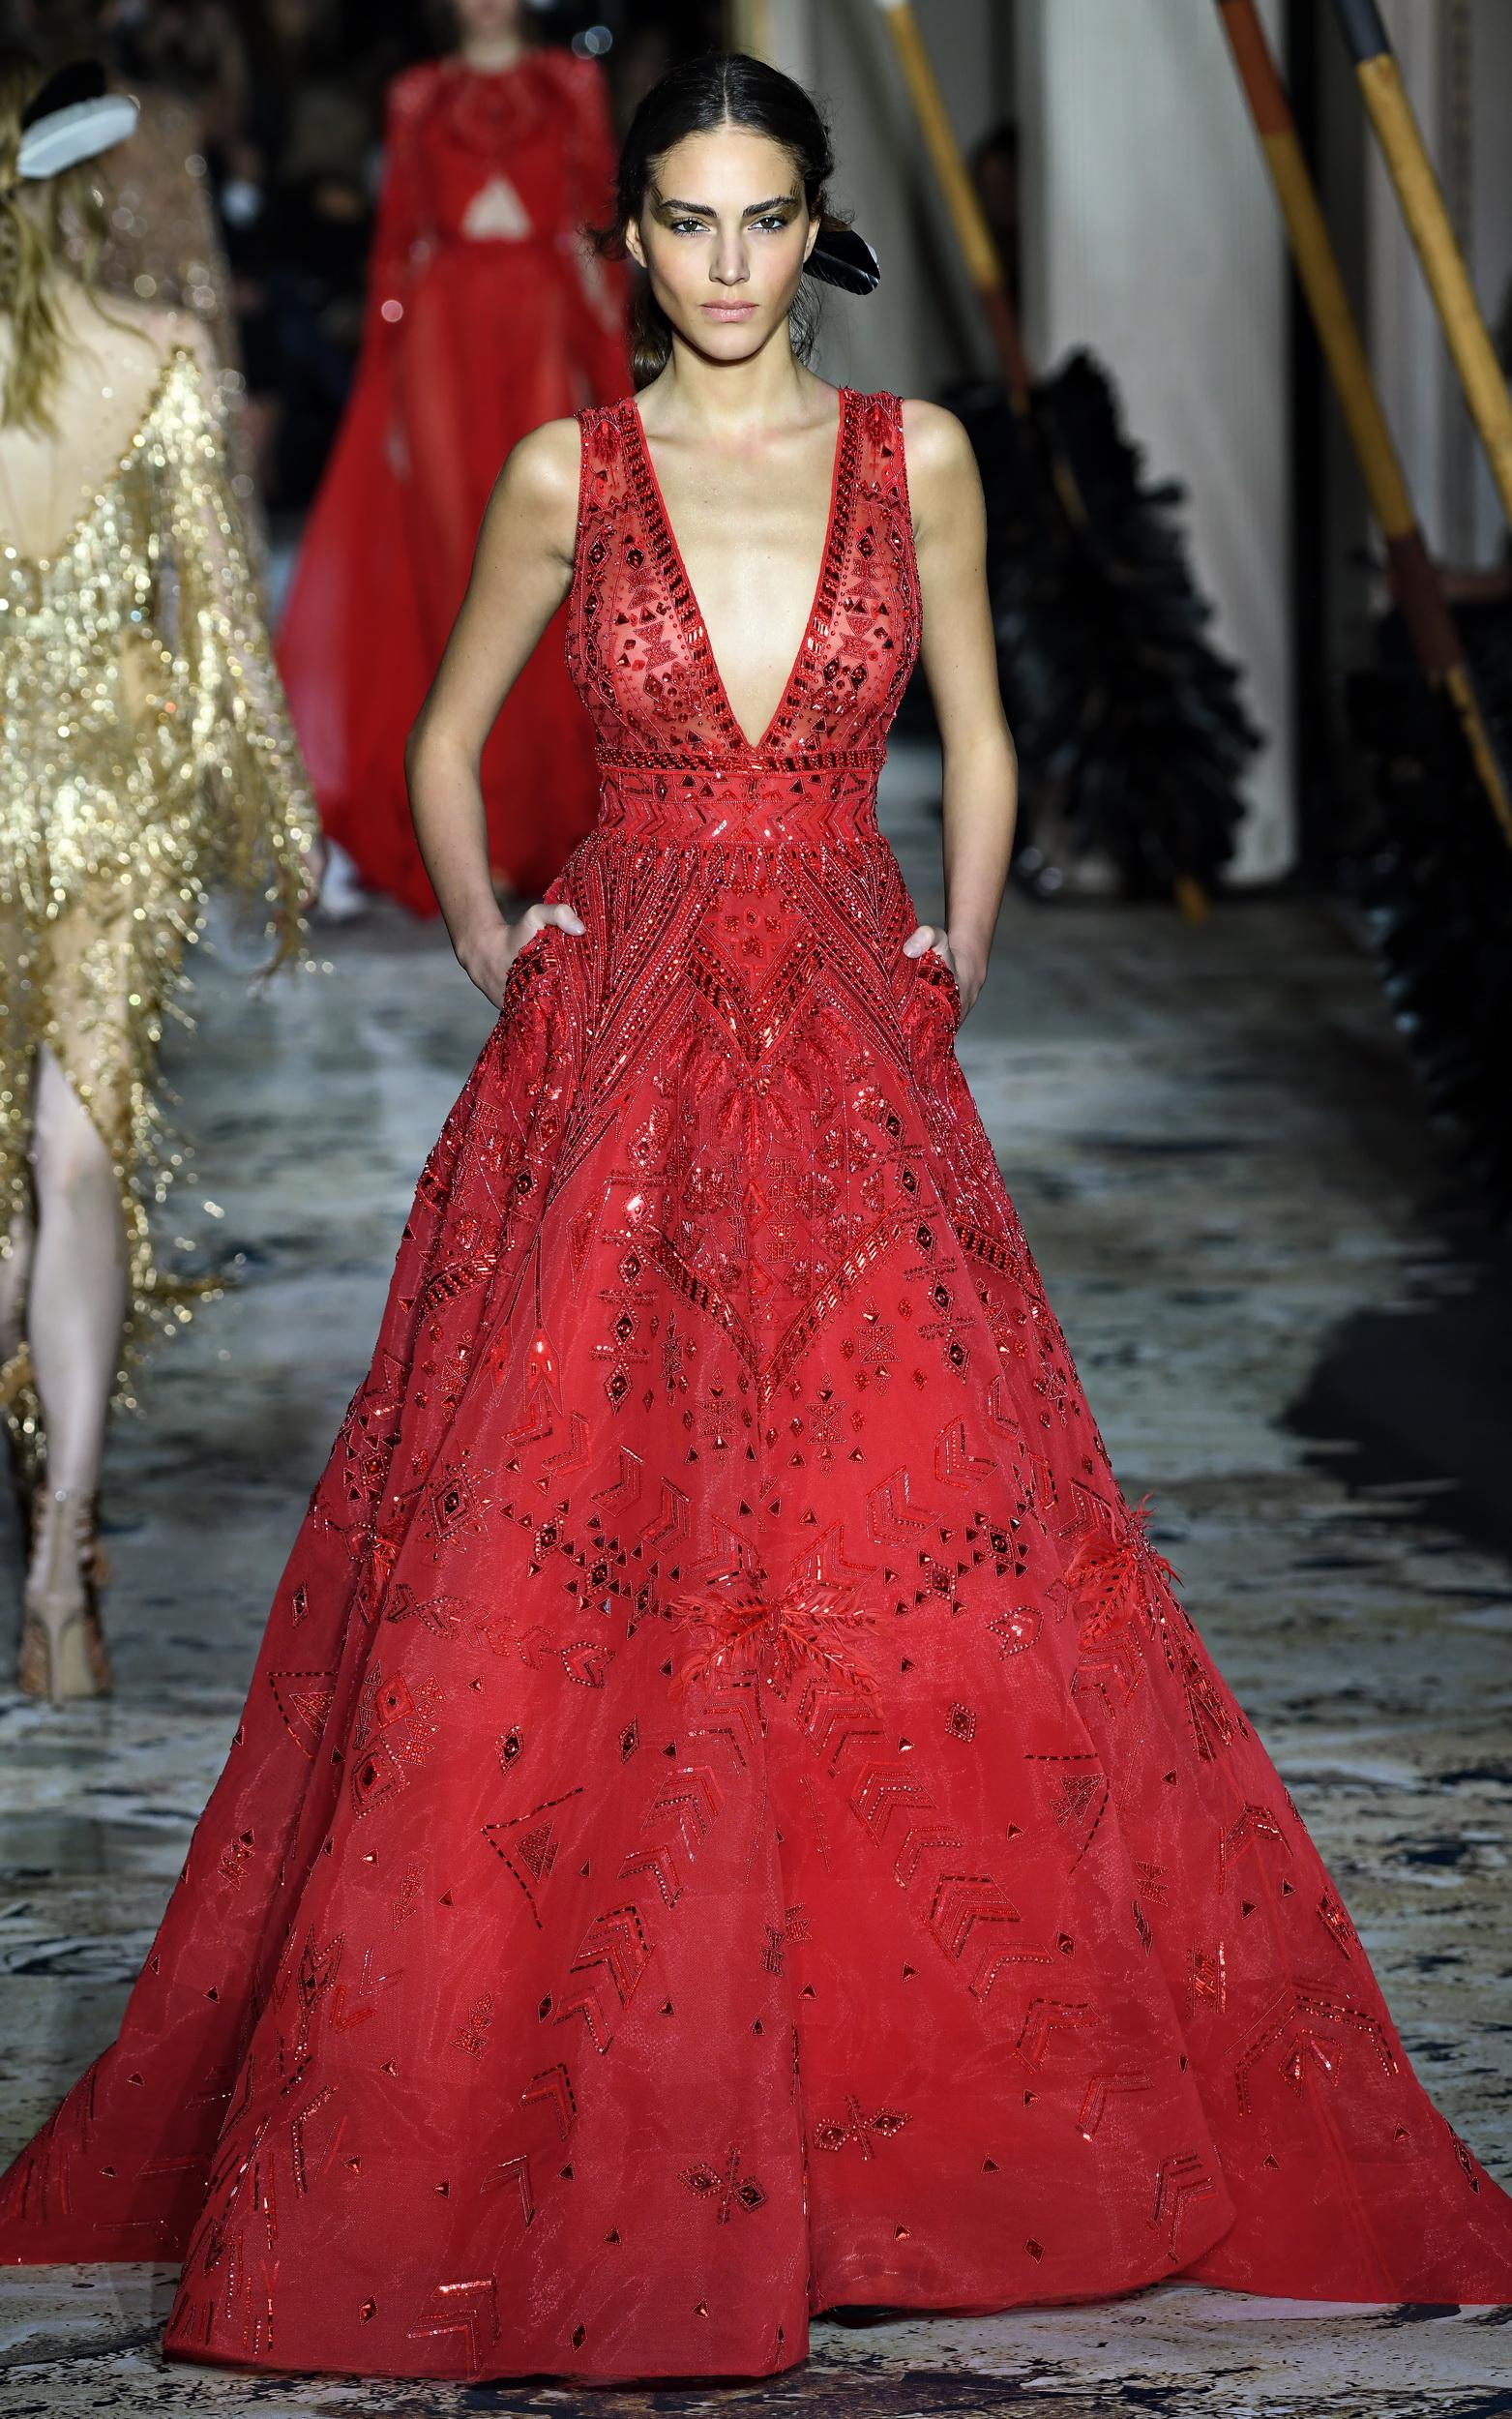 Paris Haute Couture SS 2018 Zuhair Murad 4to4u Arthur Koff 13.JPG